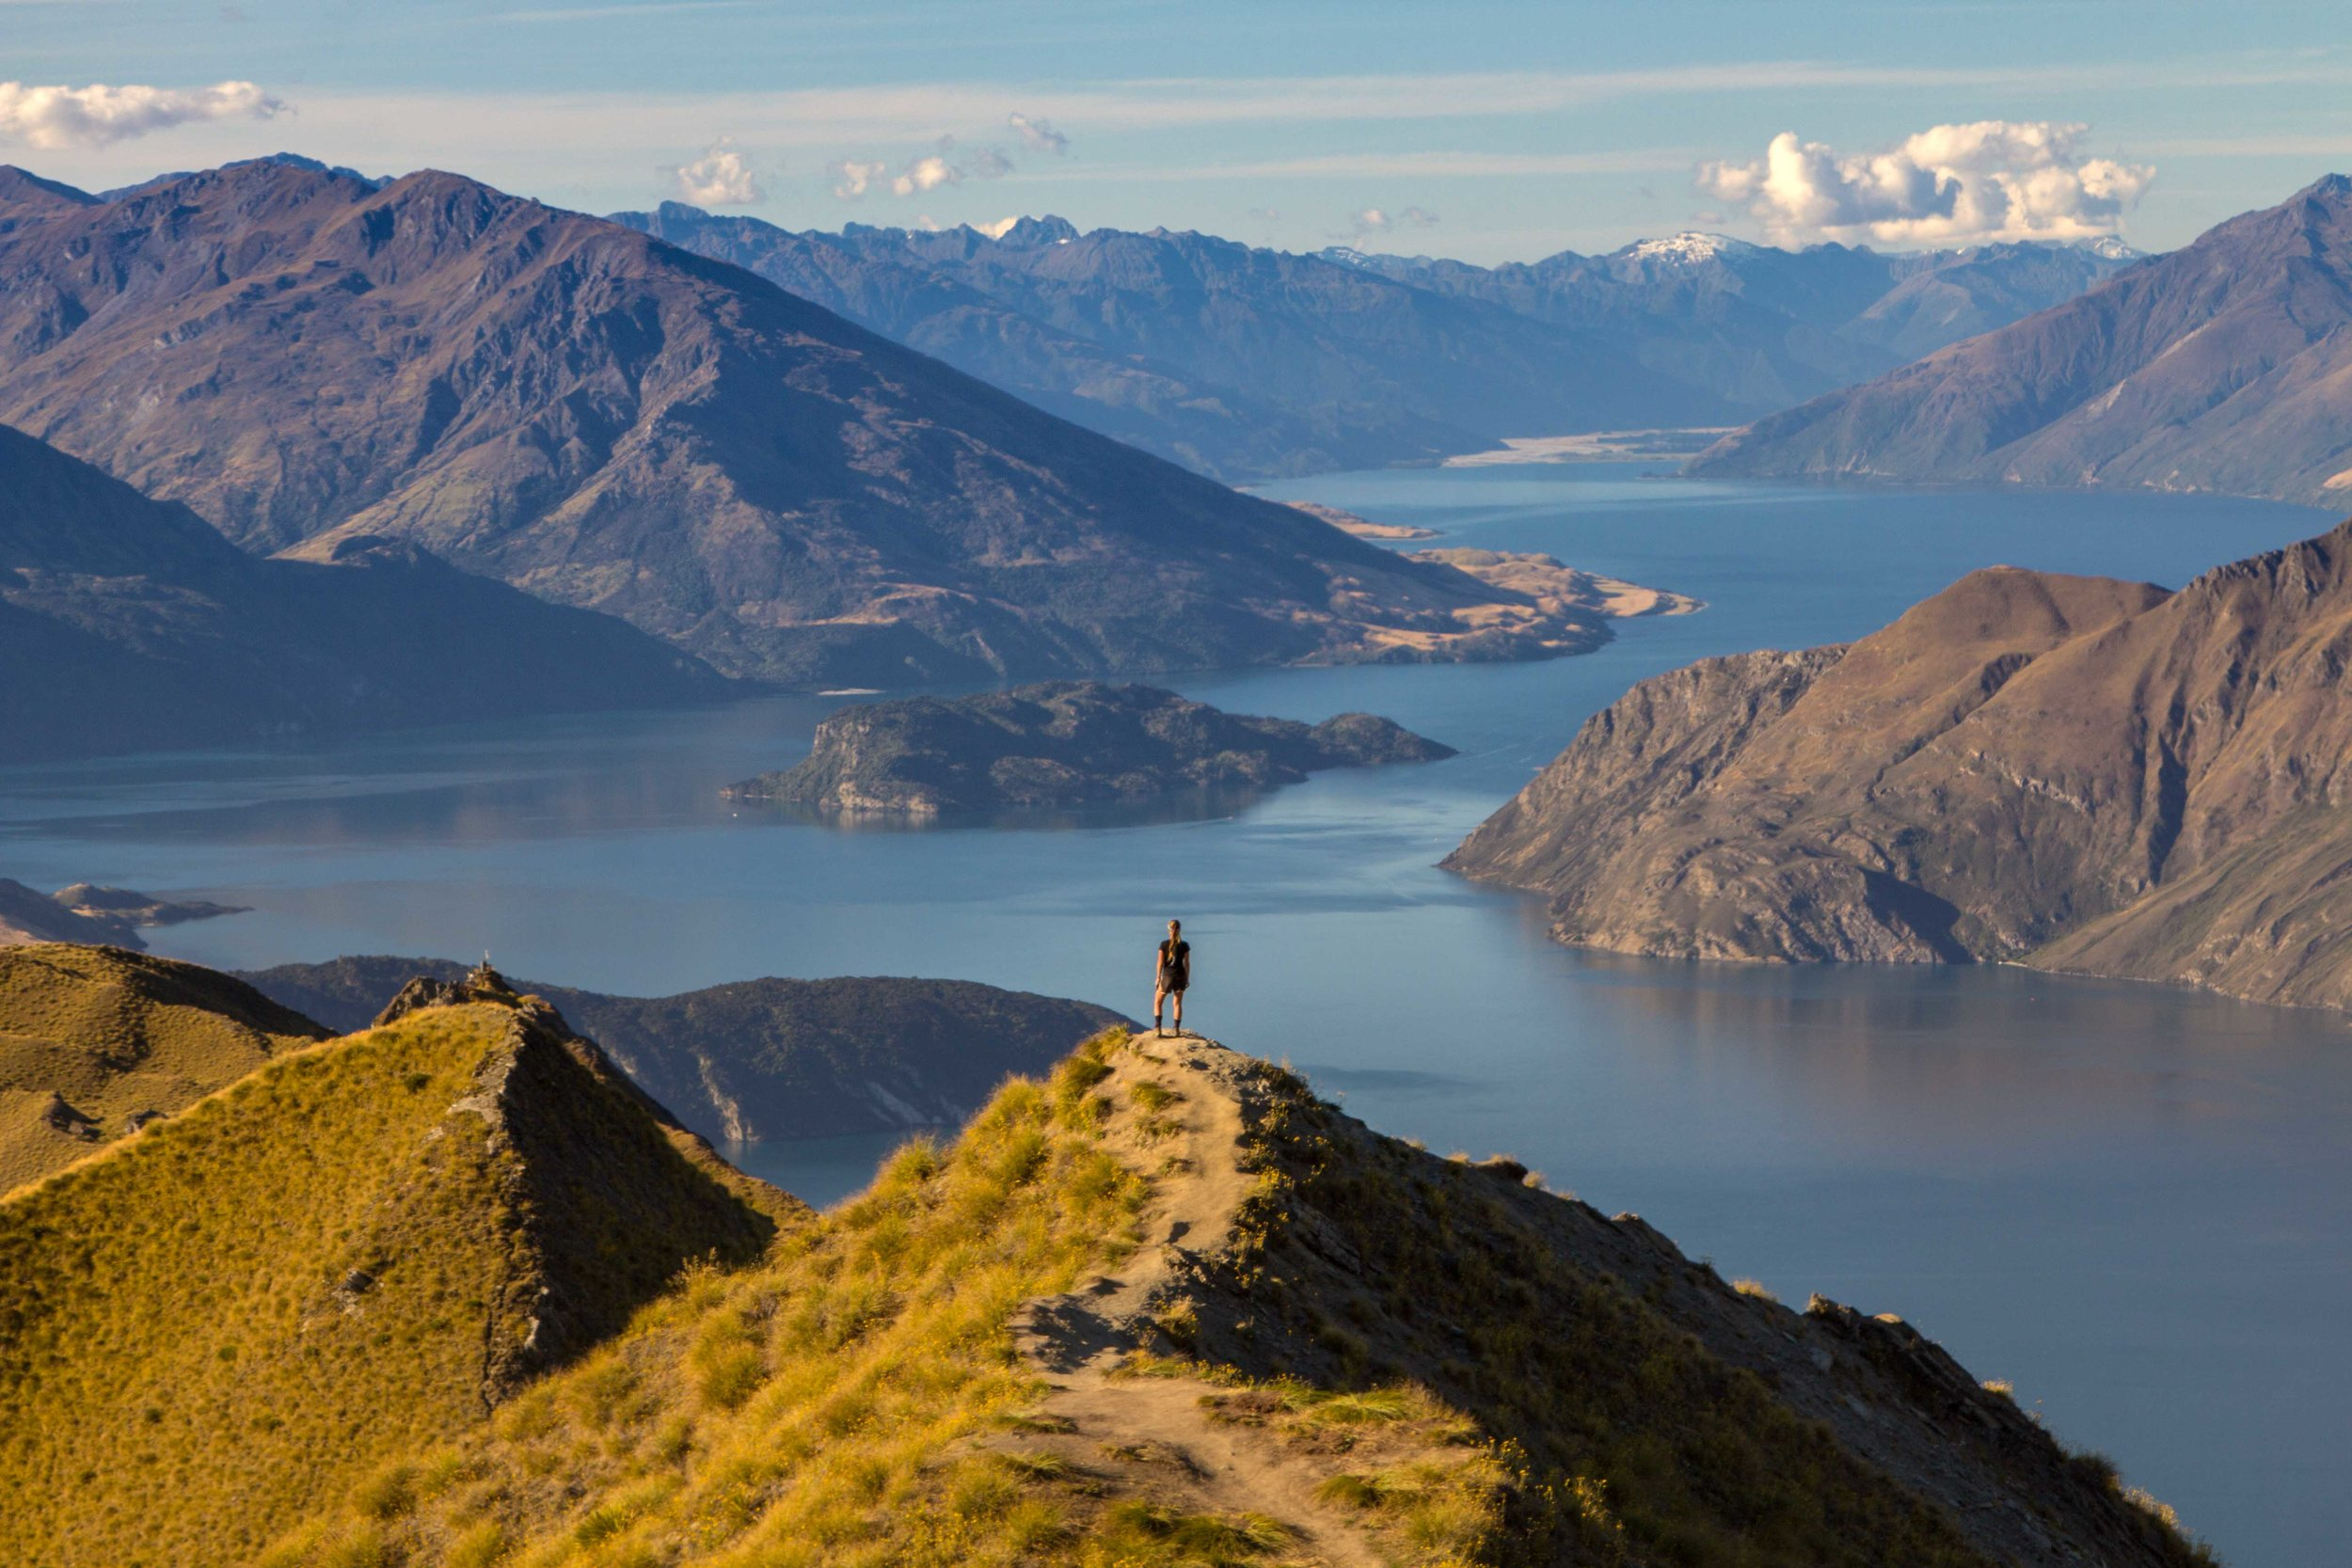 Roys Peak Wanaka New Zealand Camping (1 of 6).jpg